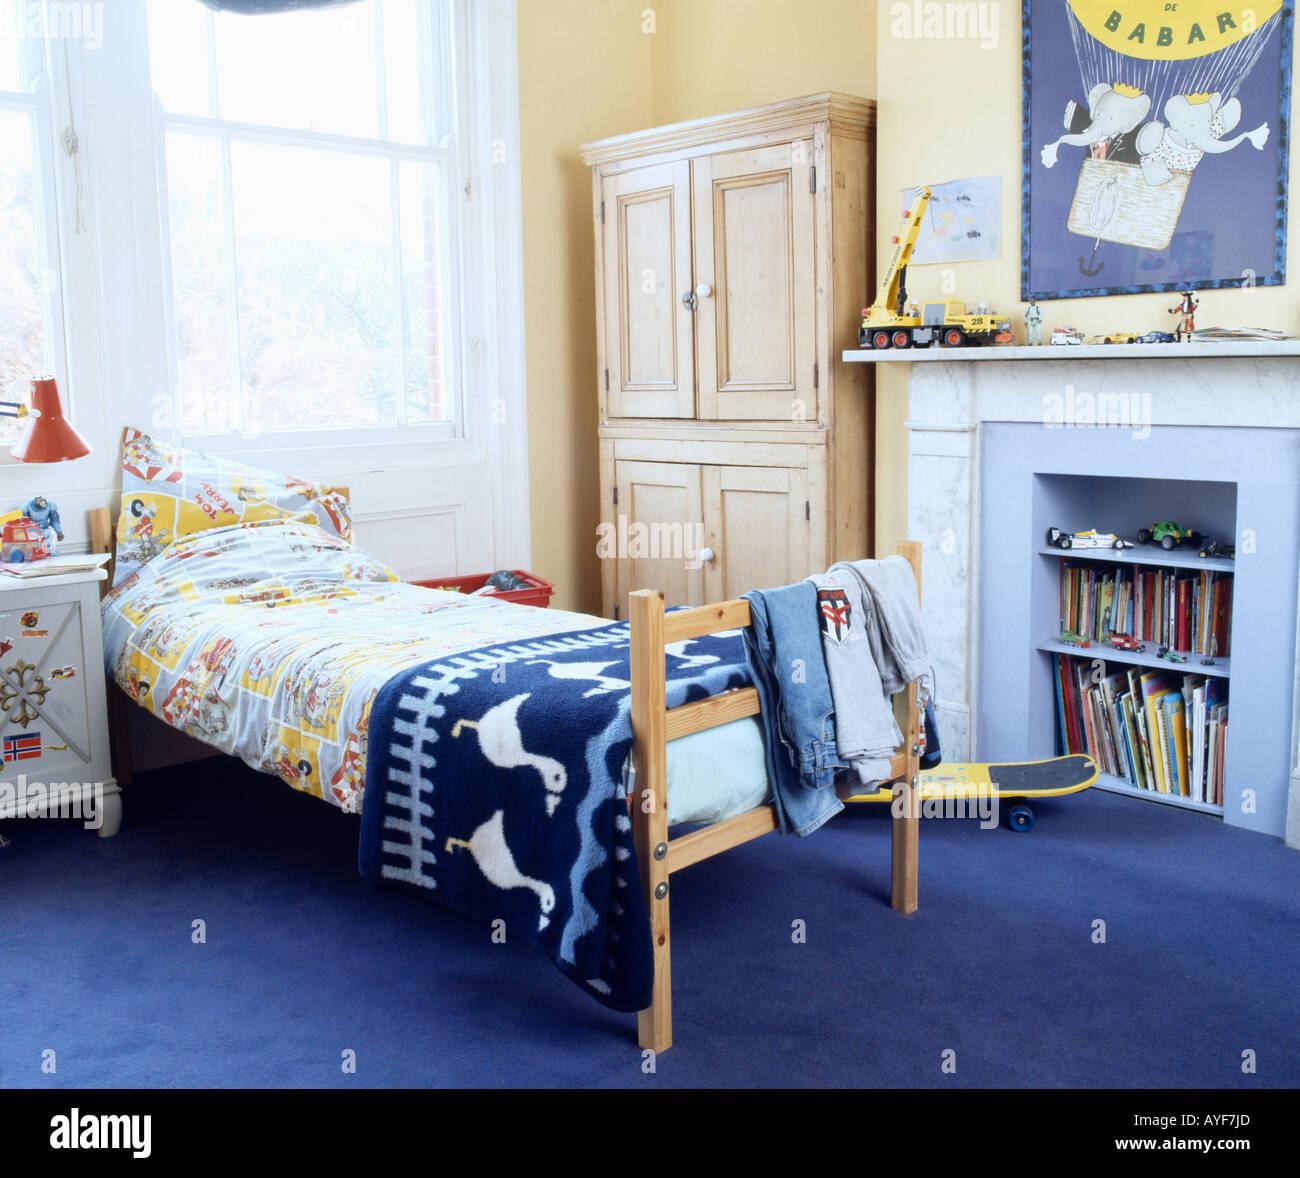 Bedroom Carpet Target Bedroom For Boy Black And White Bedroom Prints Yellow Bedroom Design Ideas: Children's Bedroom With Blue Rug On Bed And Blue Carpet